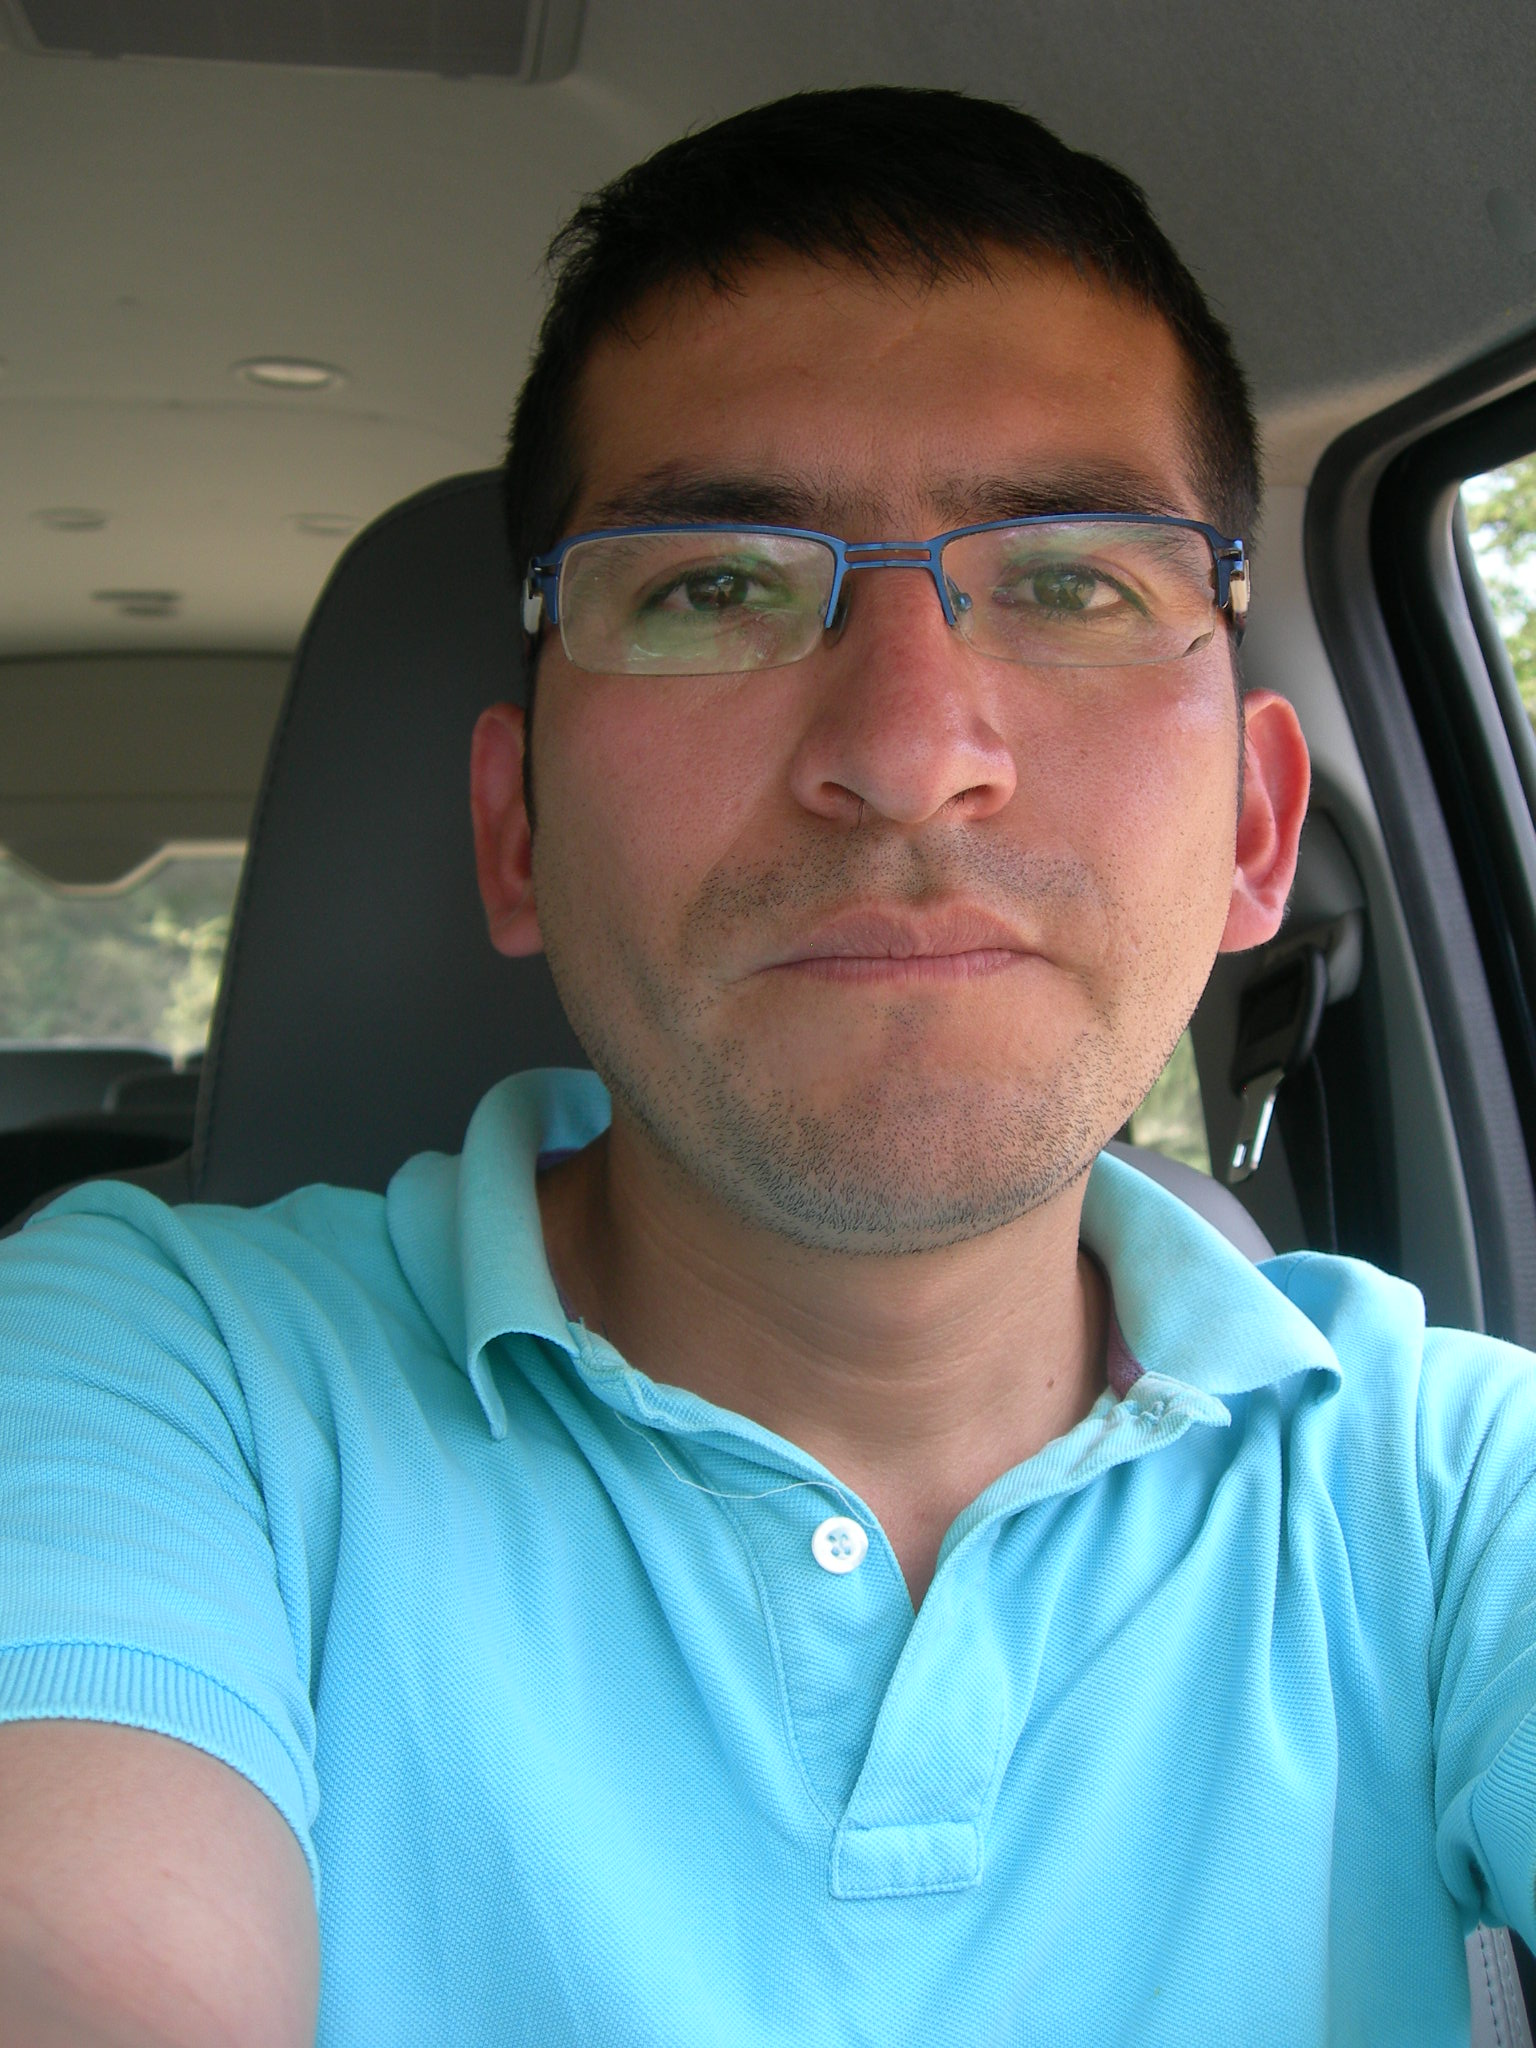 Alfonso Mend